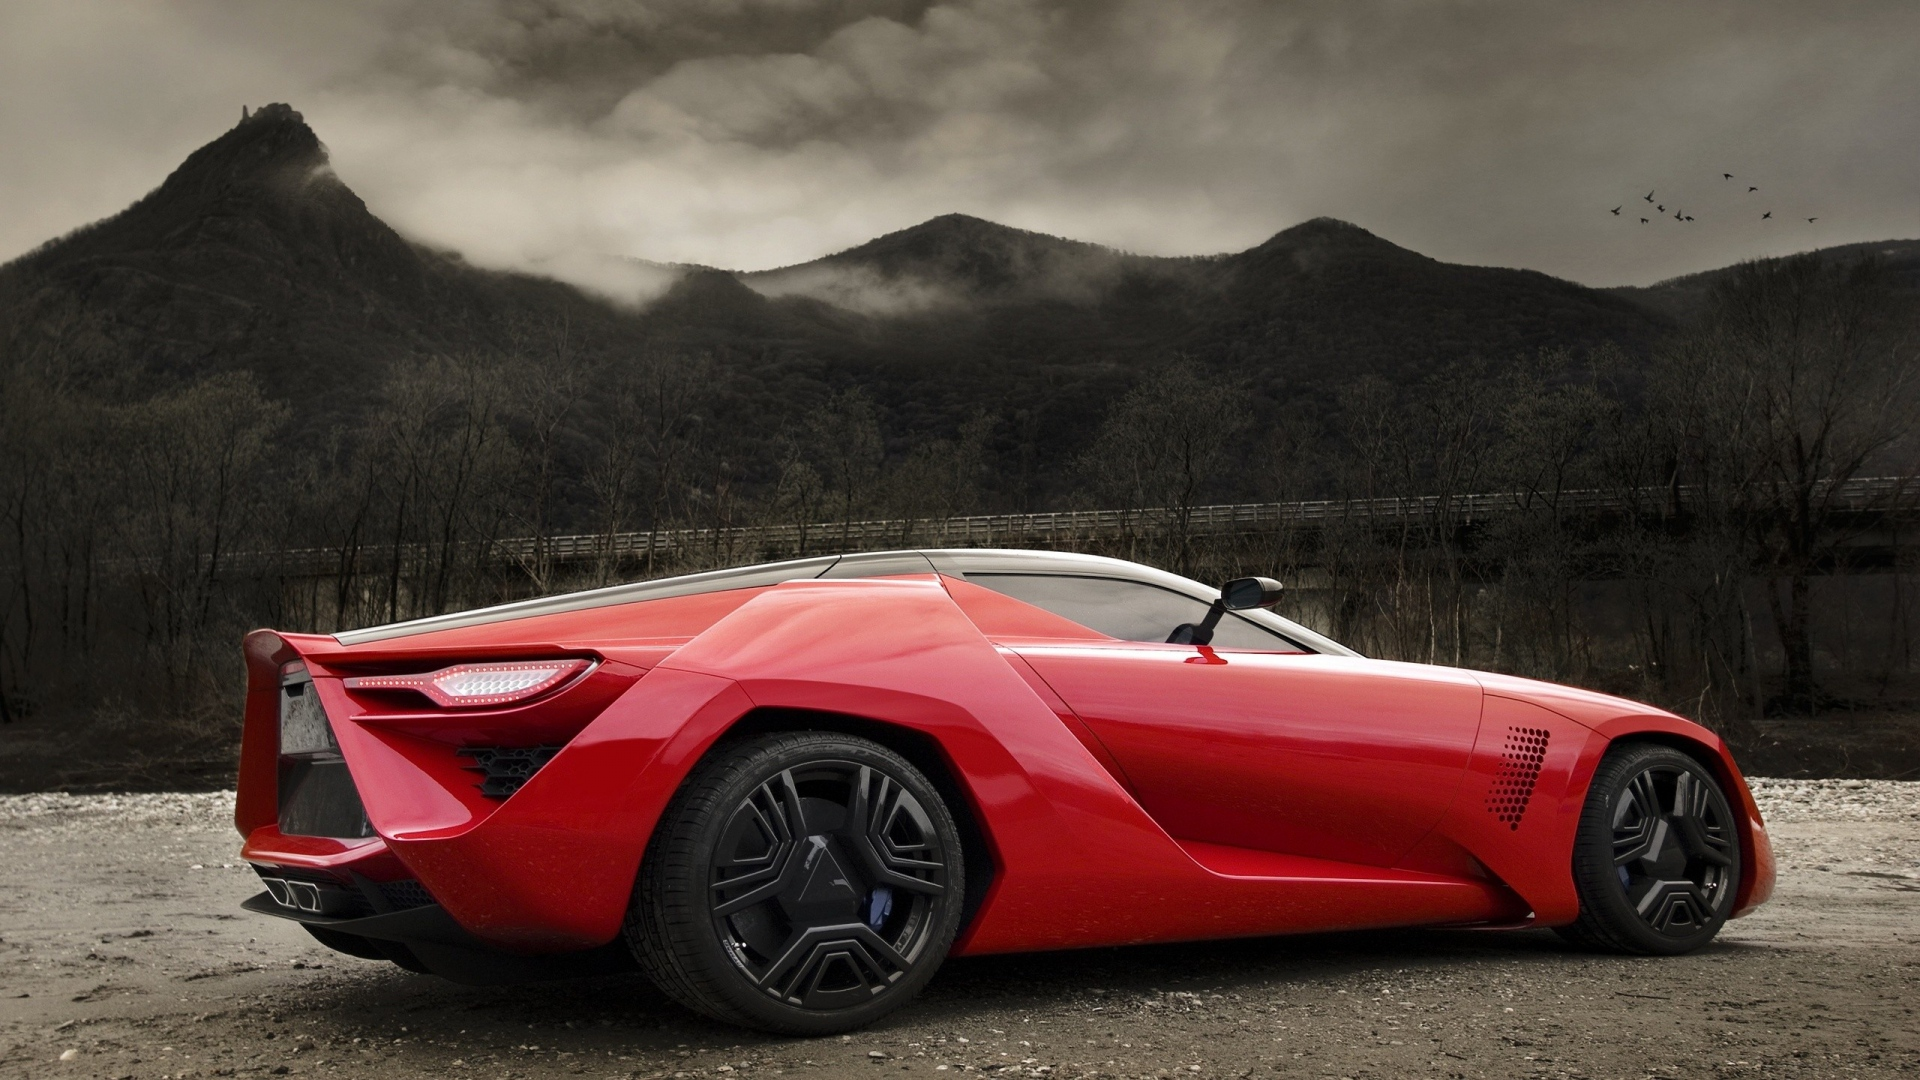 Herunterladen 1920x1080 Full Hd Hintergrundbilder Corvette